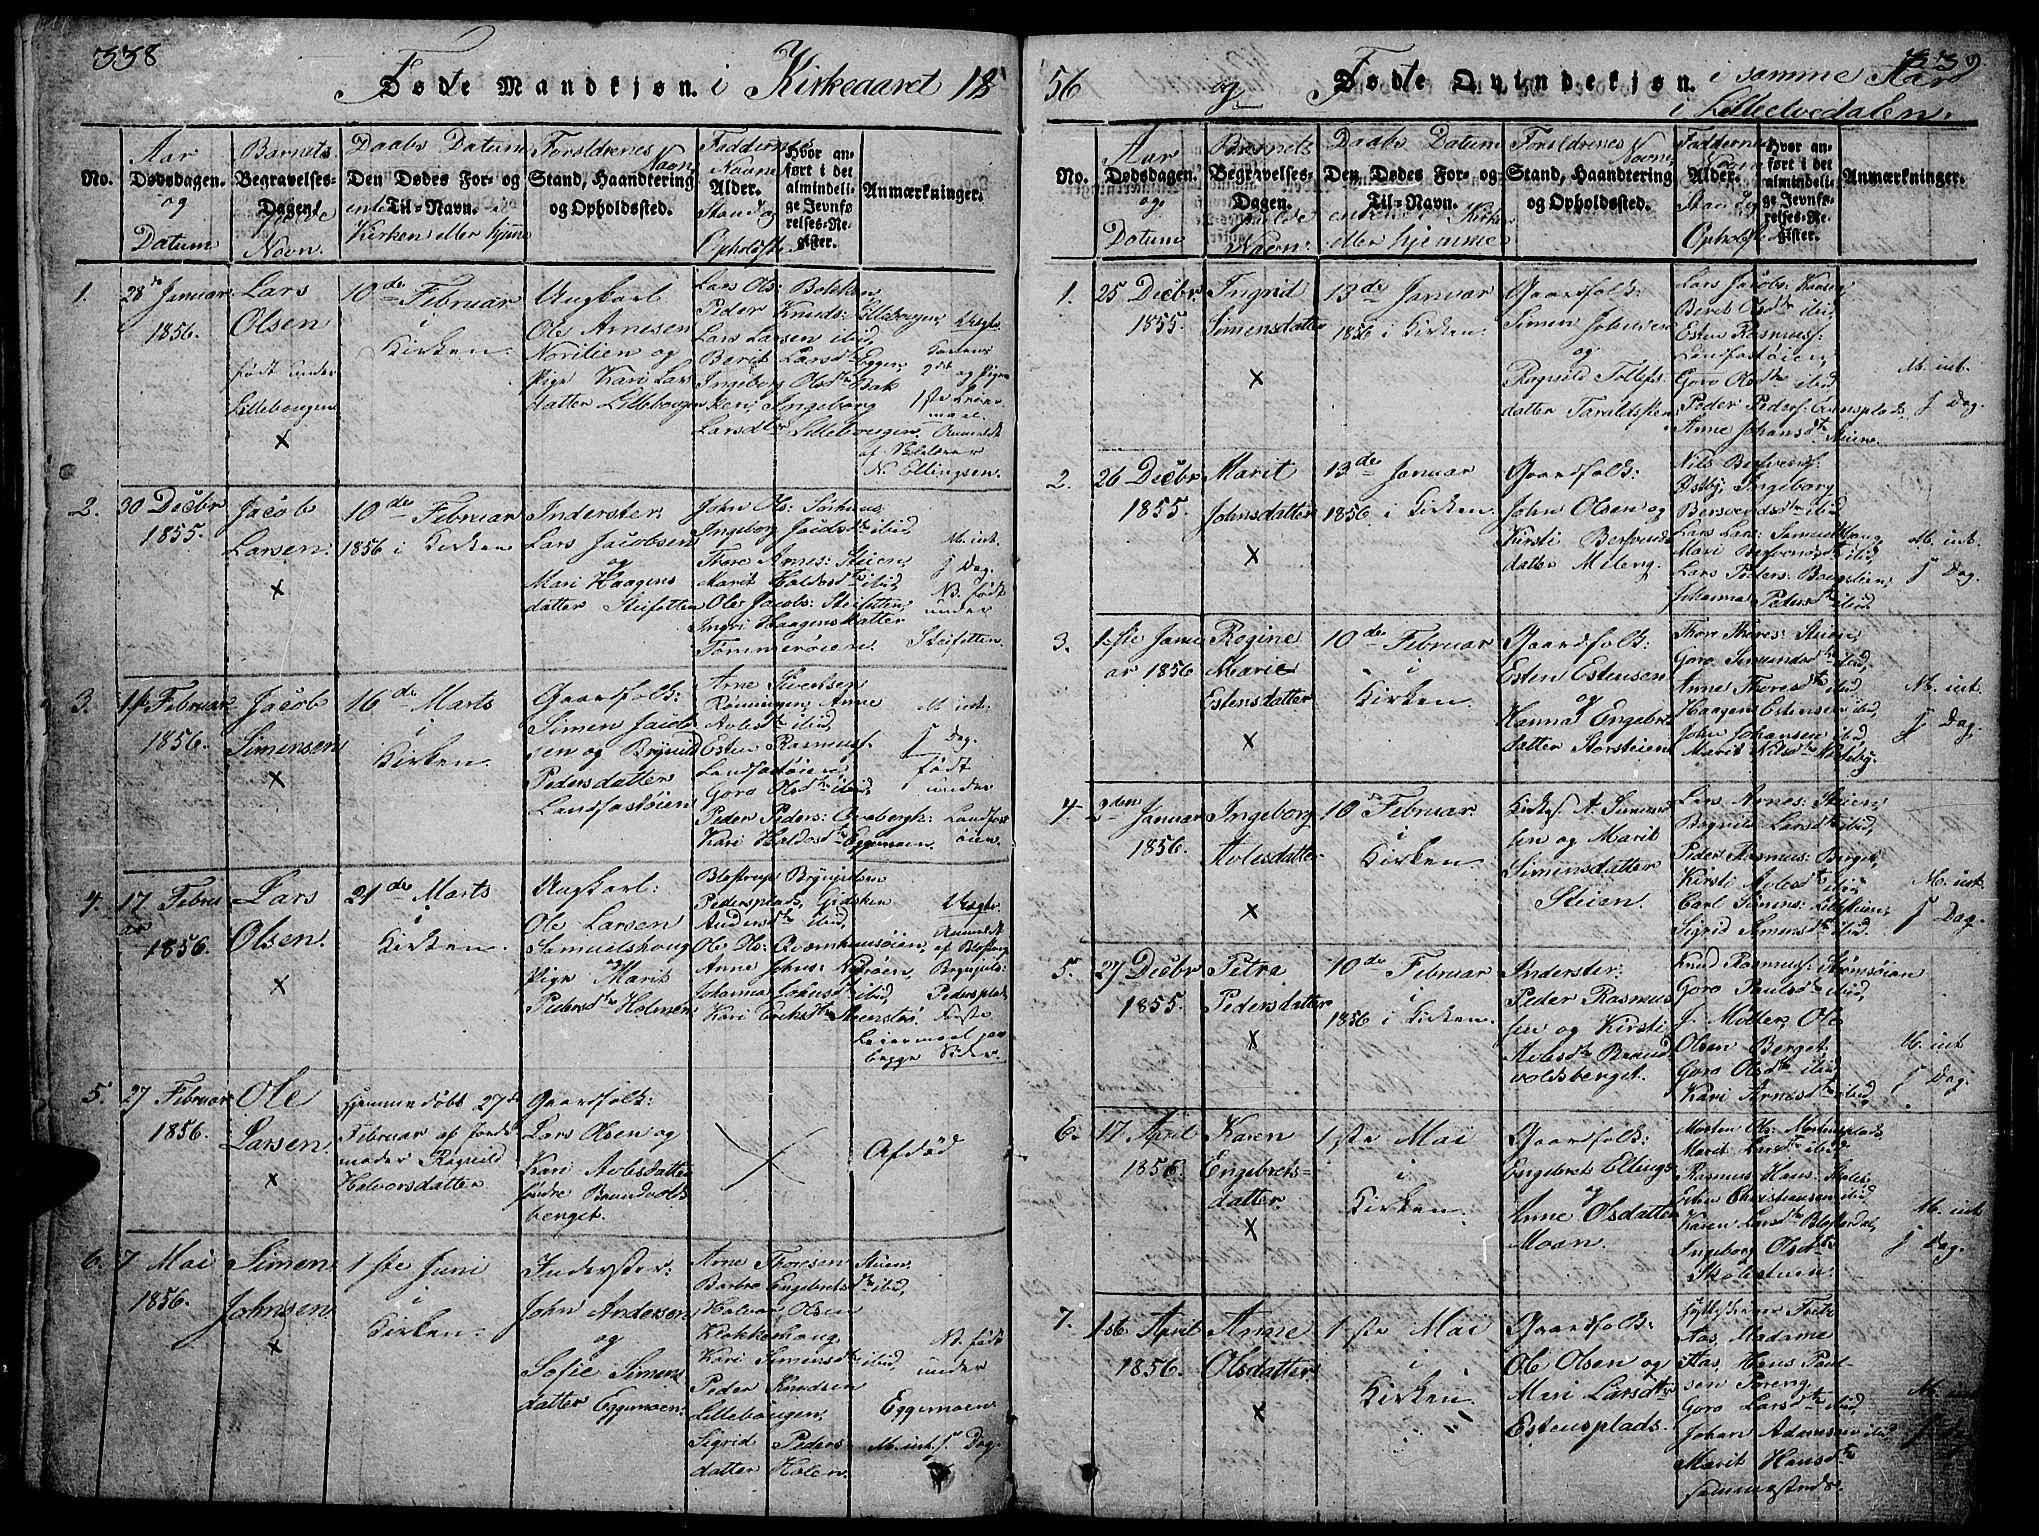 SAH, Tynset prestekontor, Klokkerbok nr. 2, 1814-1862, s. 338-339